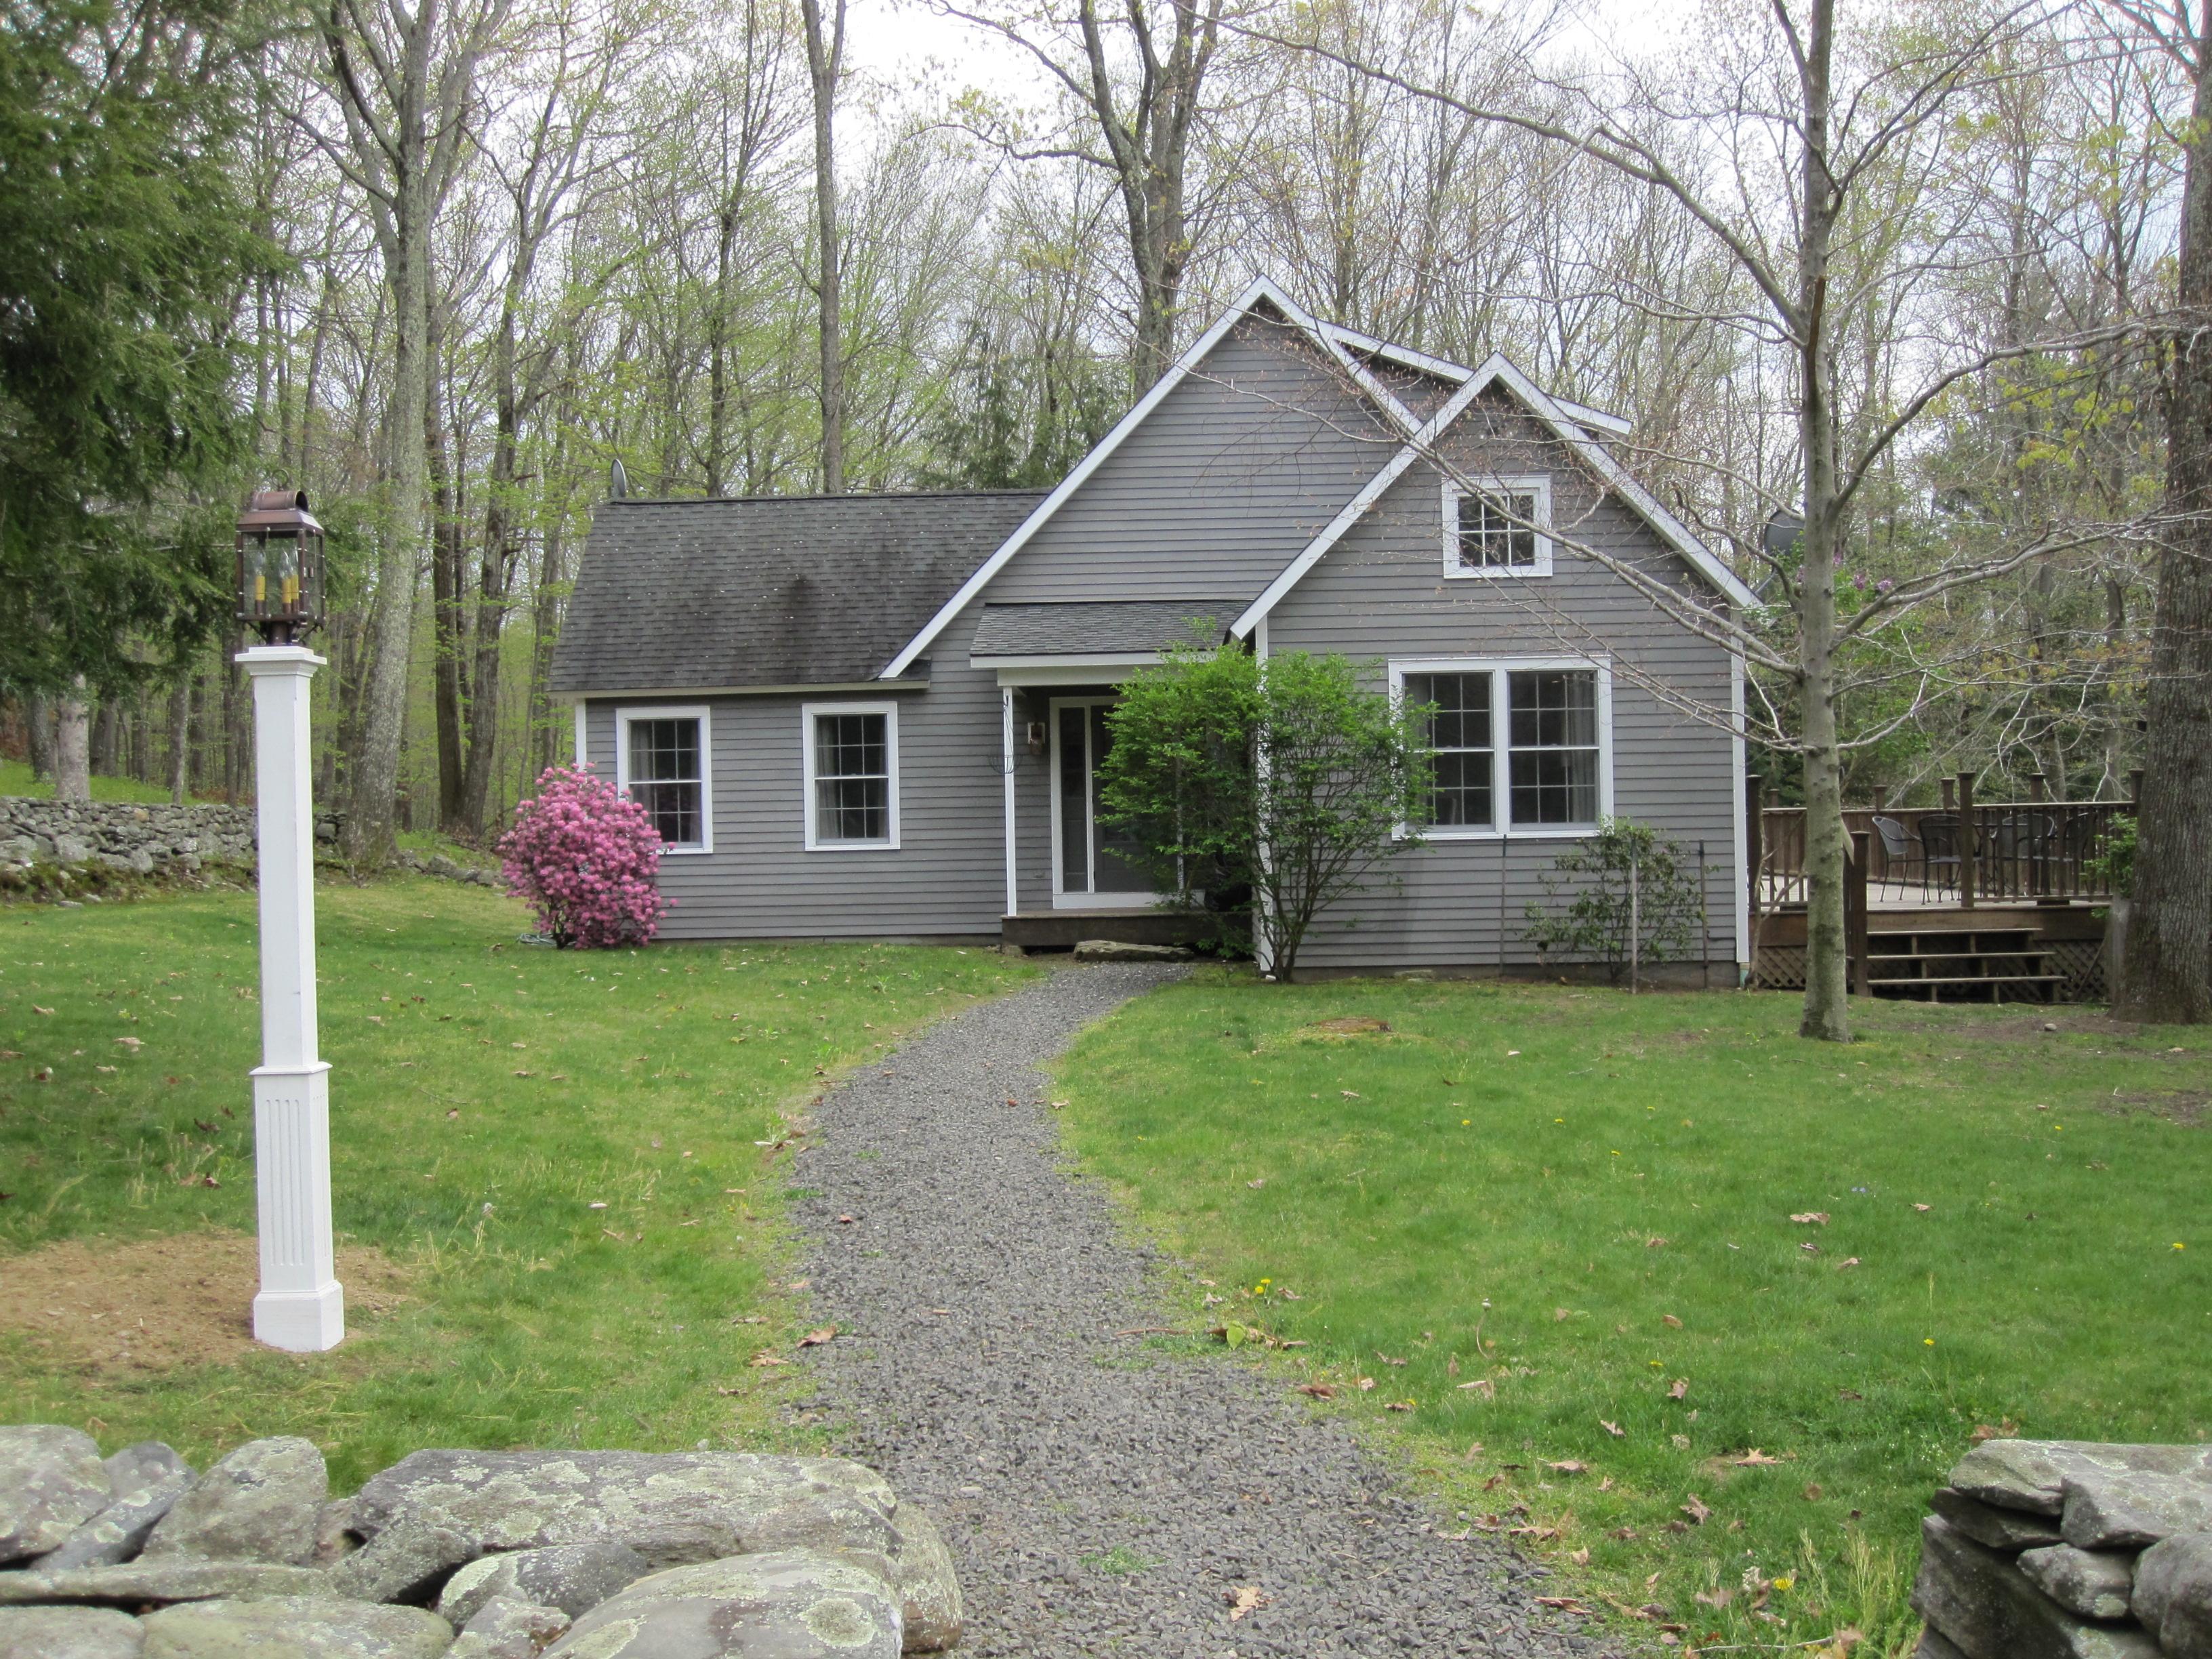 Casa Unifamiliar por un Venta en Deer Crest Cottage 402 Nettleton Hollow Rd Washington, Connecticut 06793 Estados Unidos